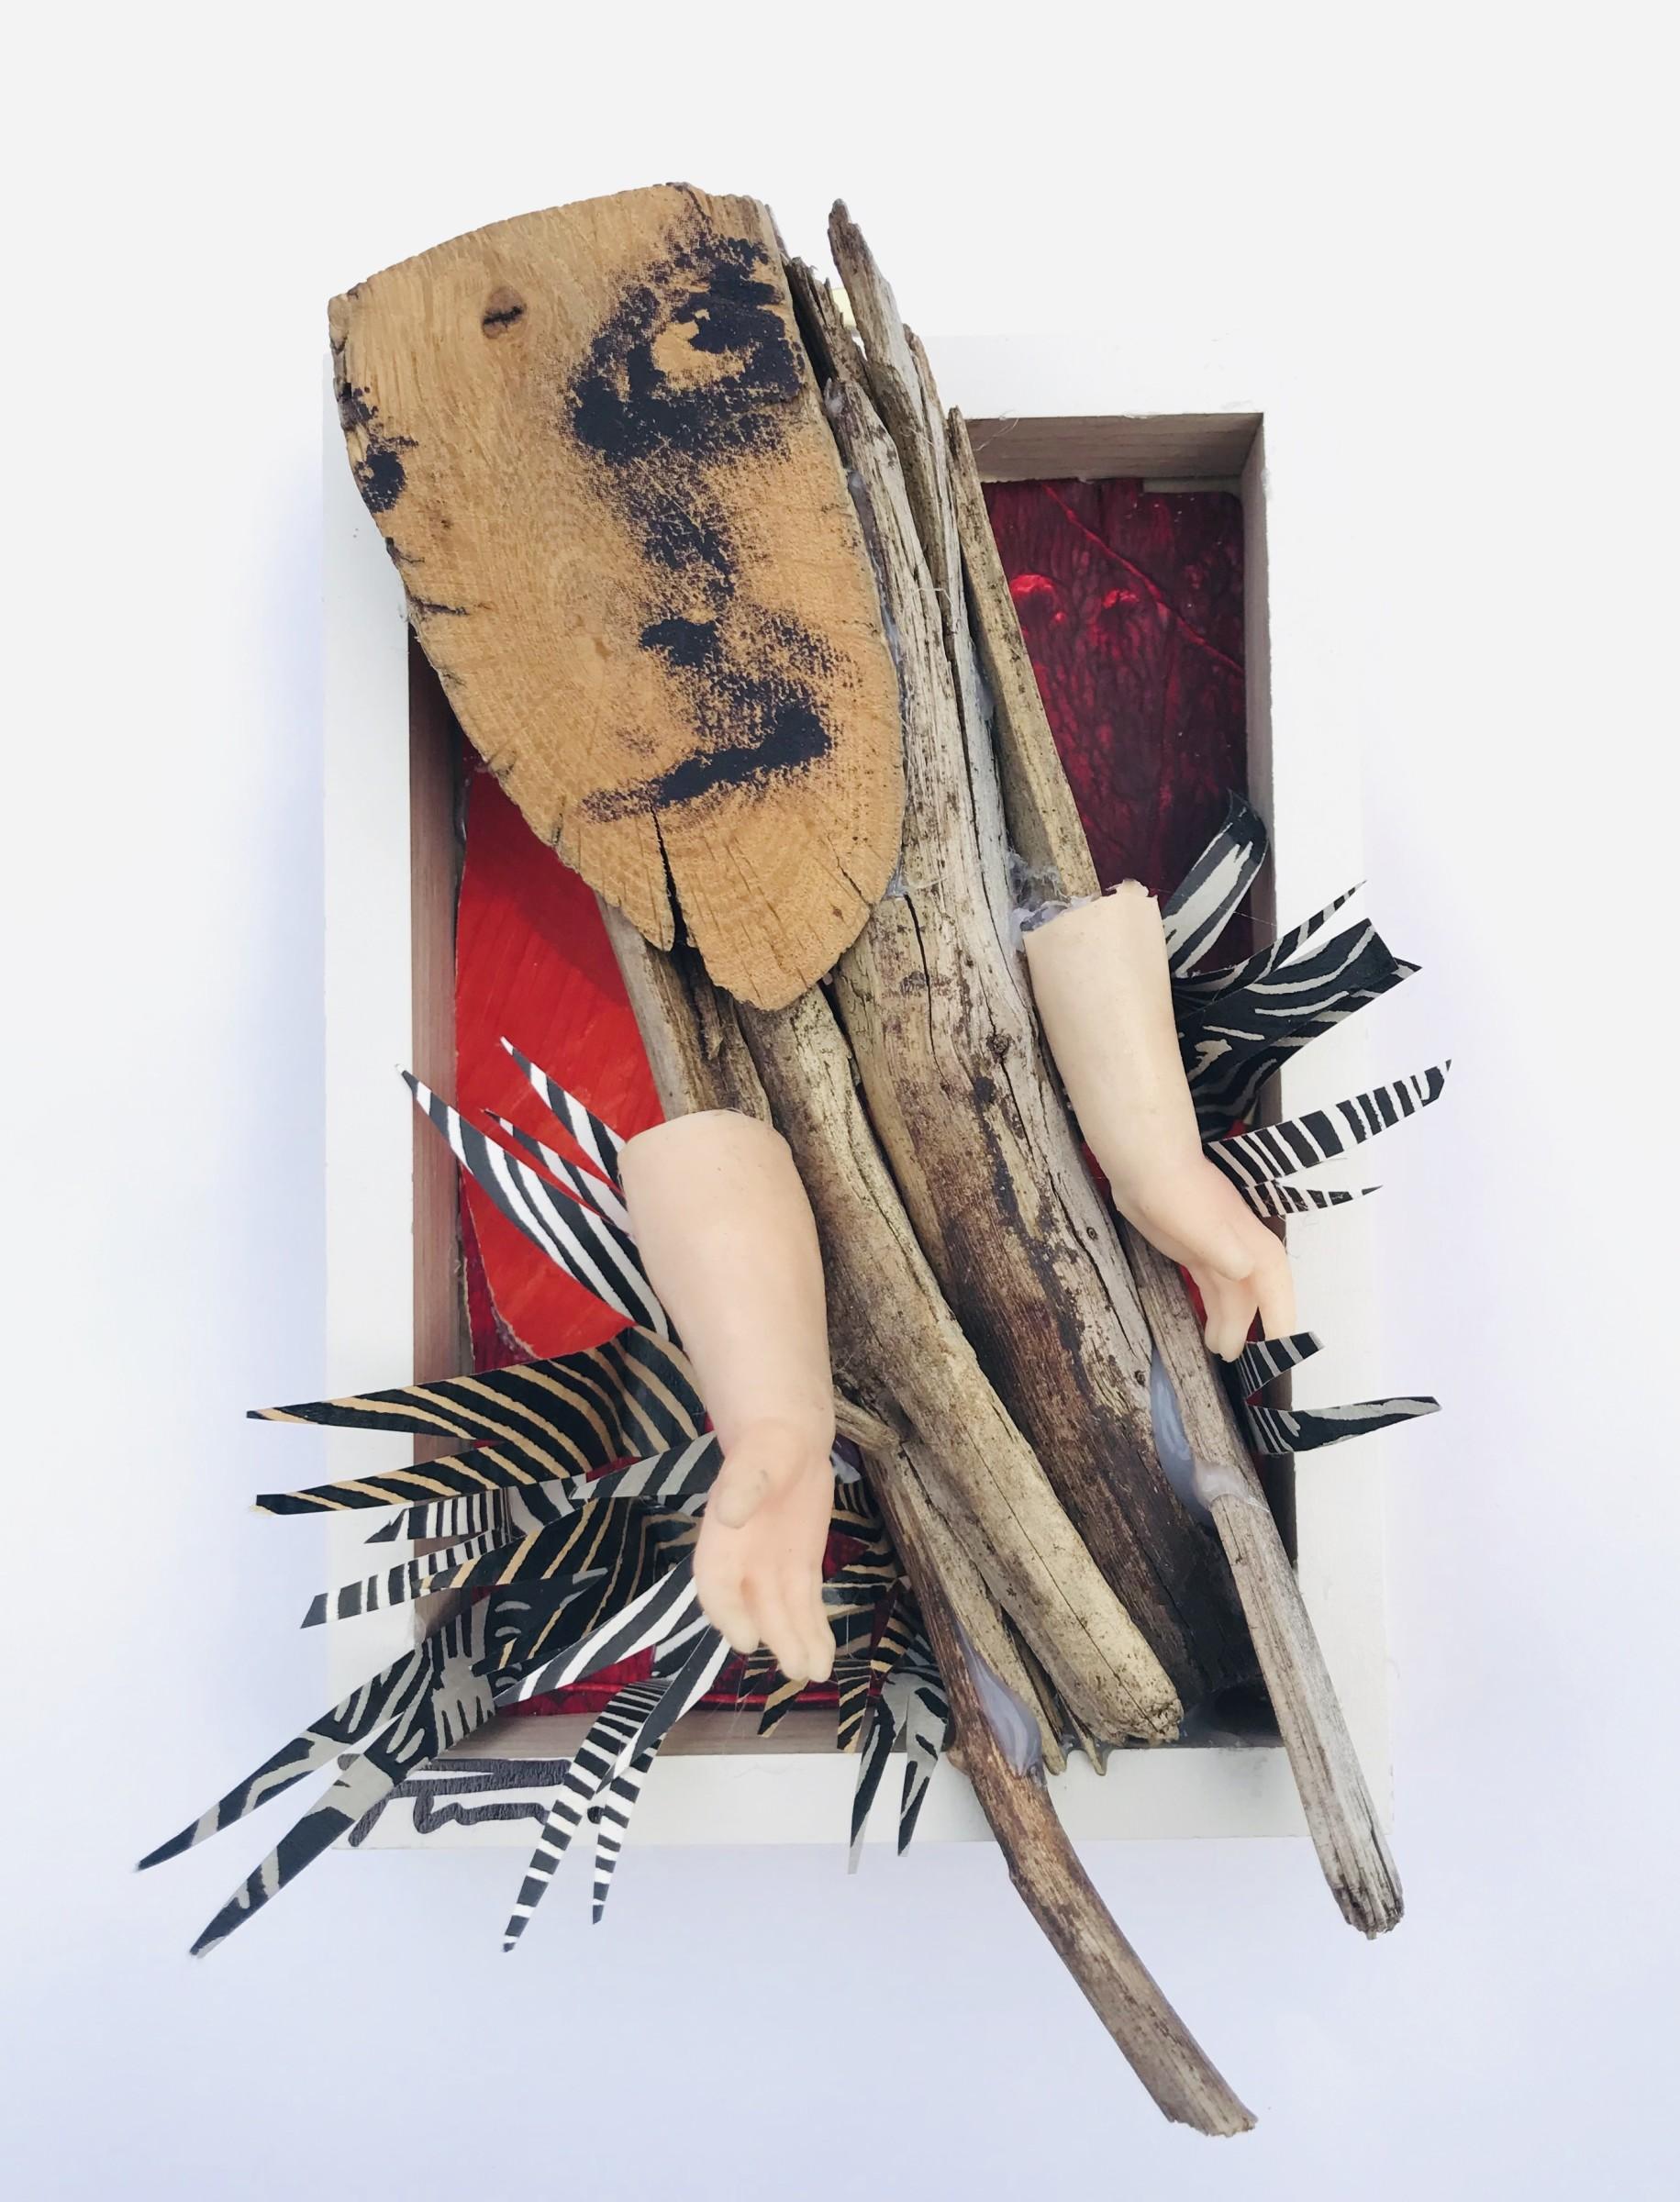 "<span class=""link fancybox-details-link""><a href=""/exhibitions/20/works/artworks_standalone10857/"">View Detail Page</a></span><div class=""artist""><span class=""artist""><strong>Pilar Munoz del Castillo RE</strong></span></div><div class=""title""><em>Rebellion</em></div><div class=""medium"">Mixed media screen print on wood </div><div class=""dimensions"">10 x 15 x 6 cm </div><div class=""edition_details"">unique</div>"